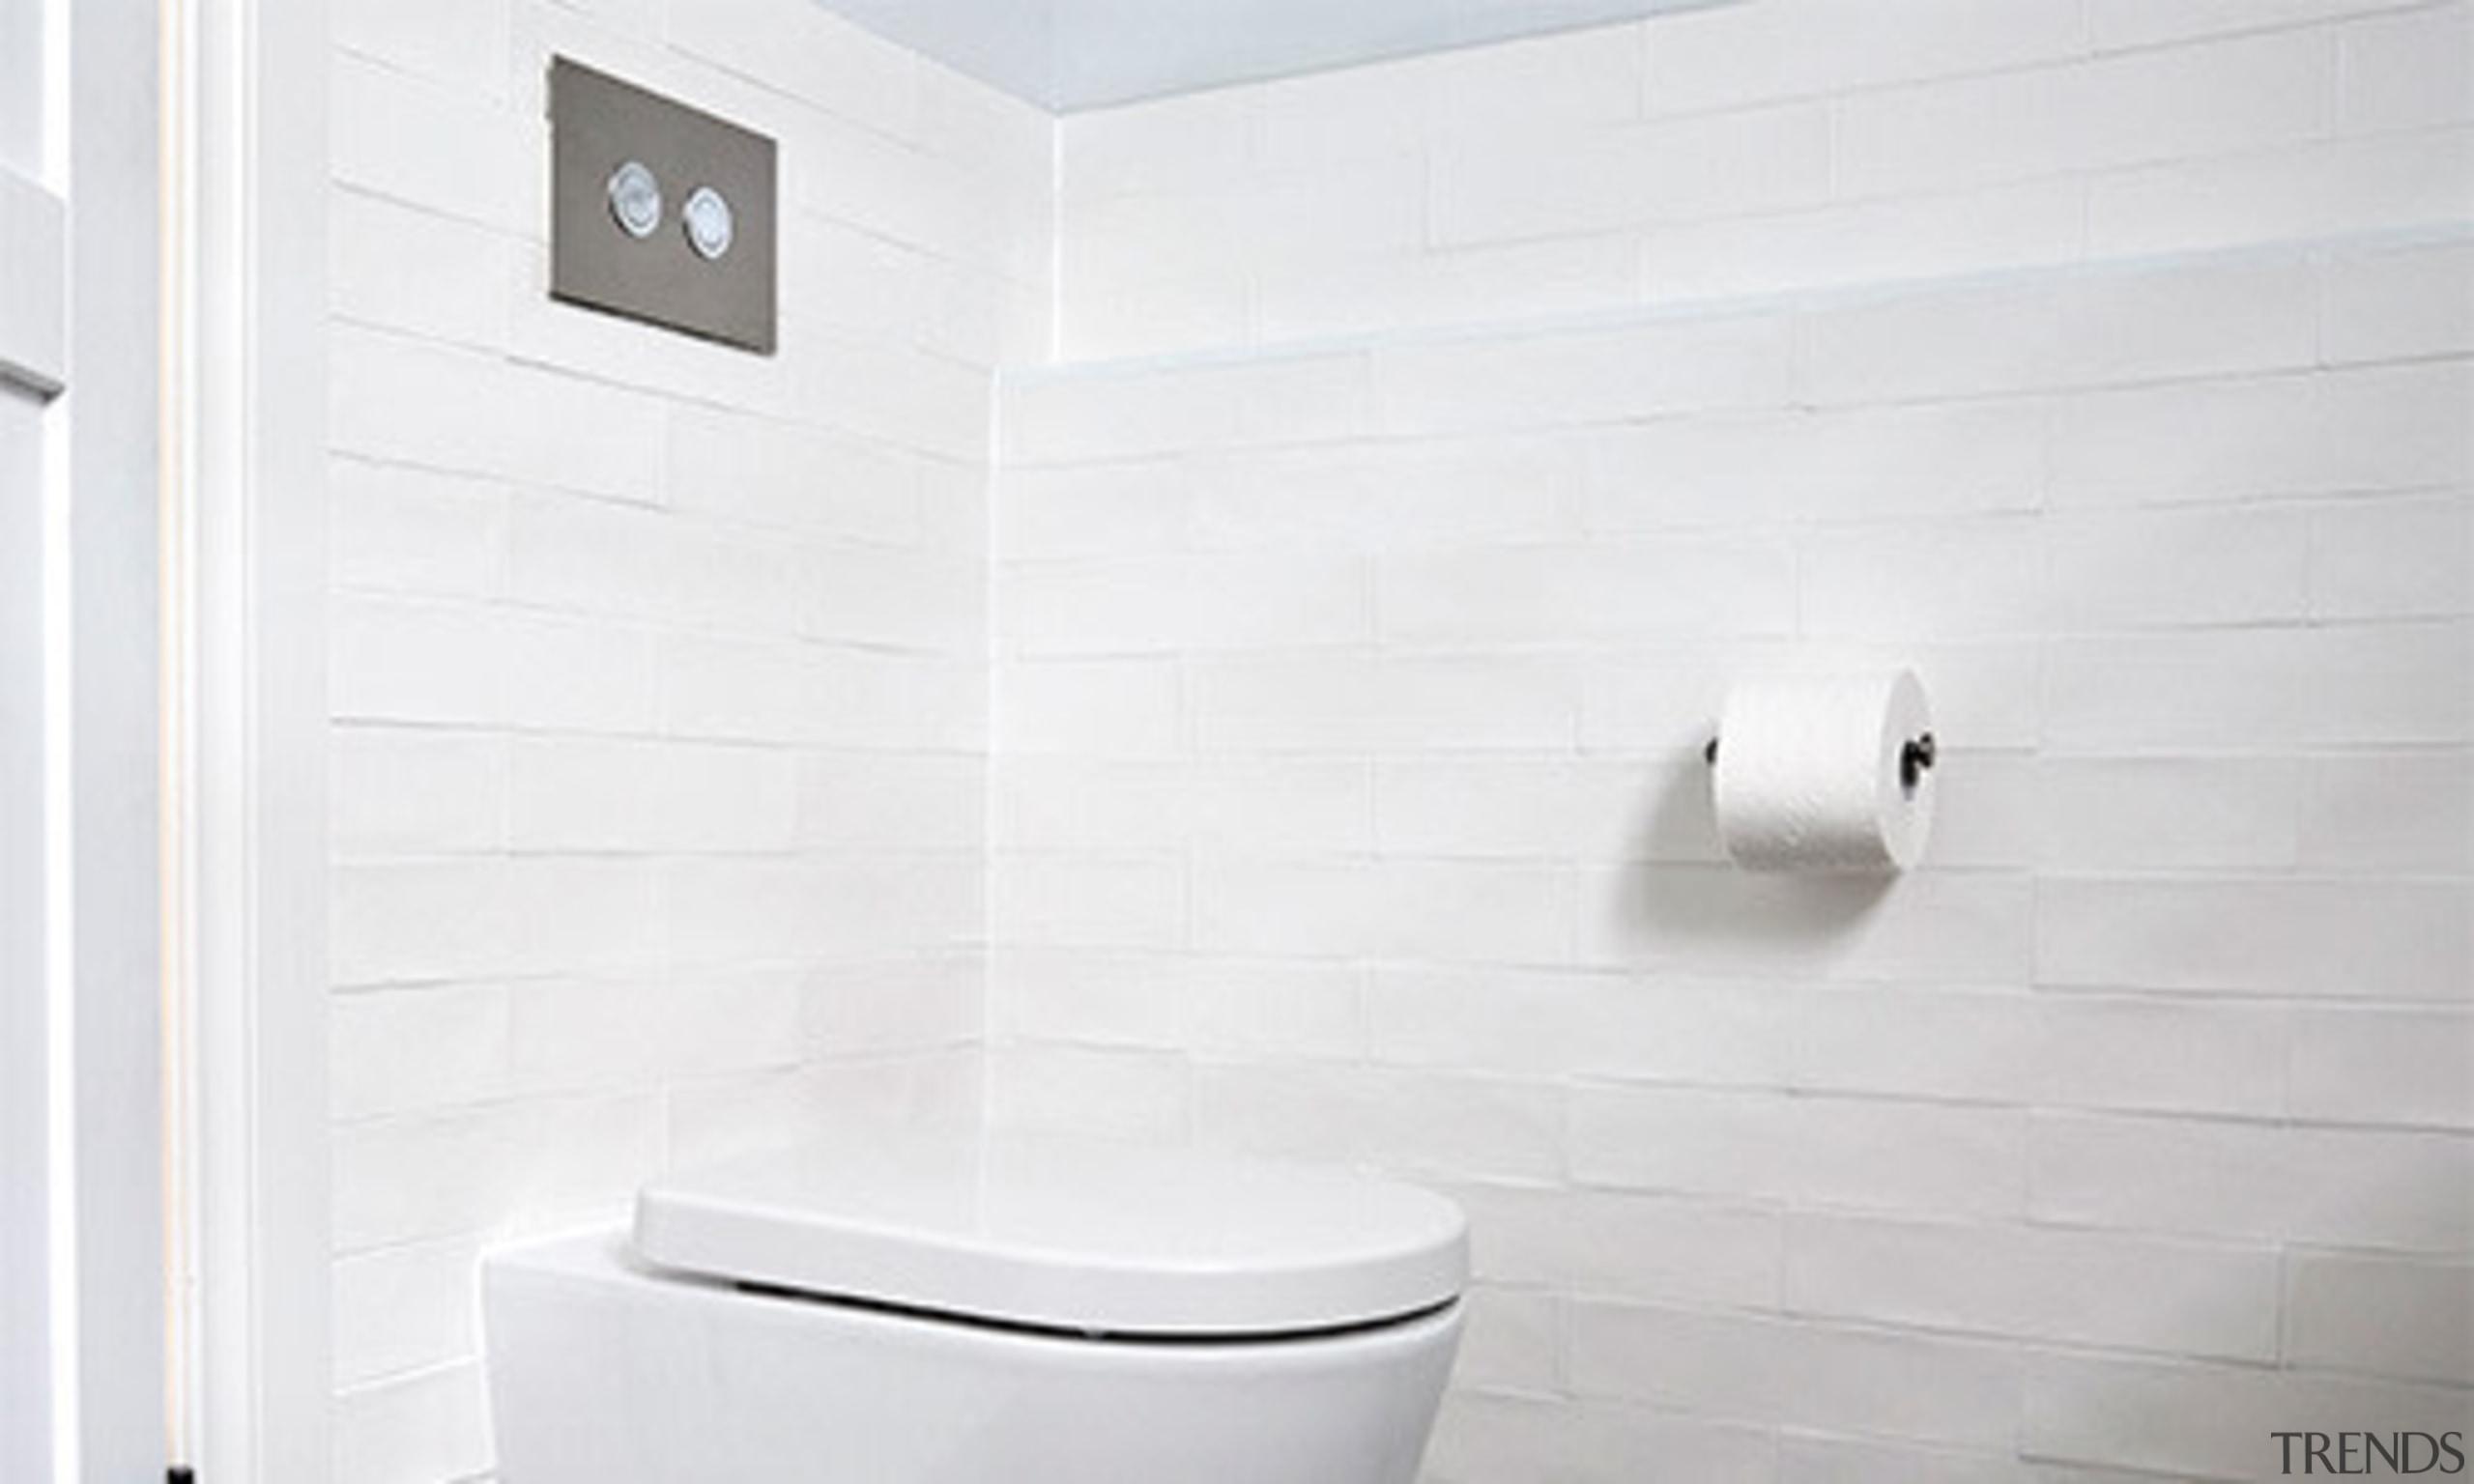 Cisterns provide a clean look - Thepowderoom Hideaway bathroom, bathroom accessory, bathroom cabinet, bathroom sink, bidet, ceramic, floor, plumbing fixture, tap, tile, toilet, toilet seat, wall, white